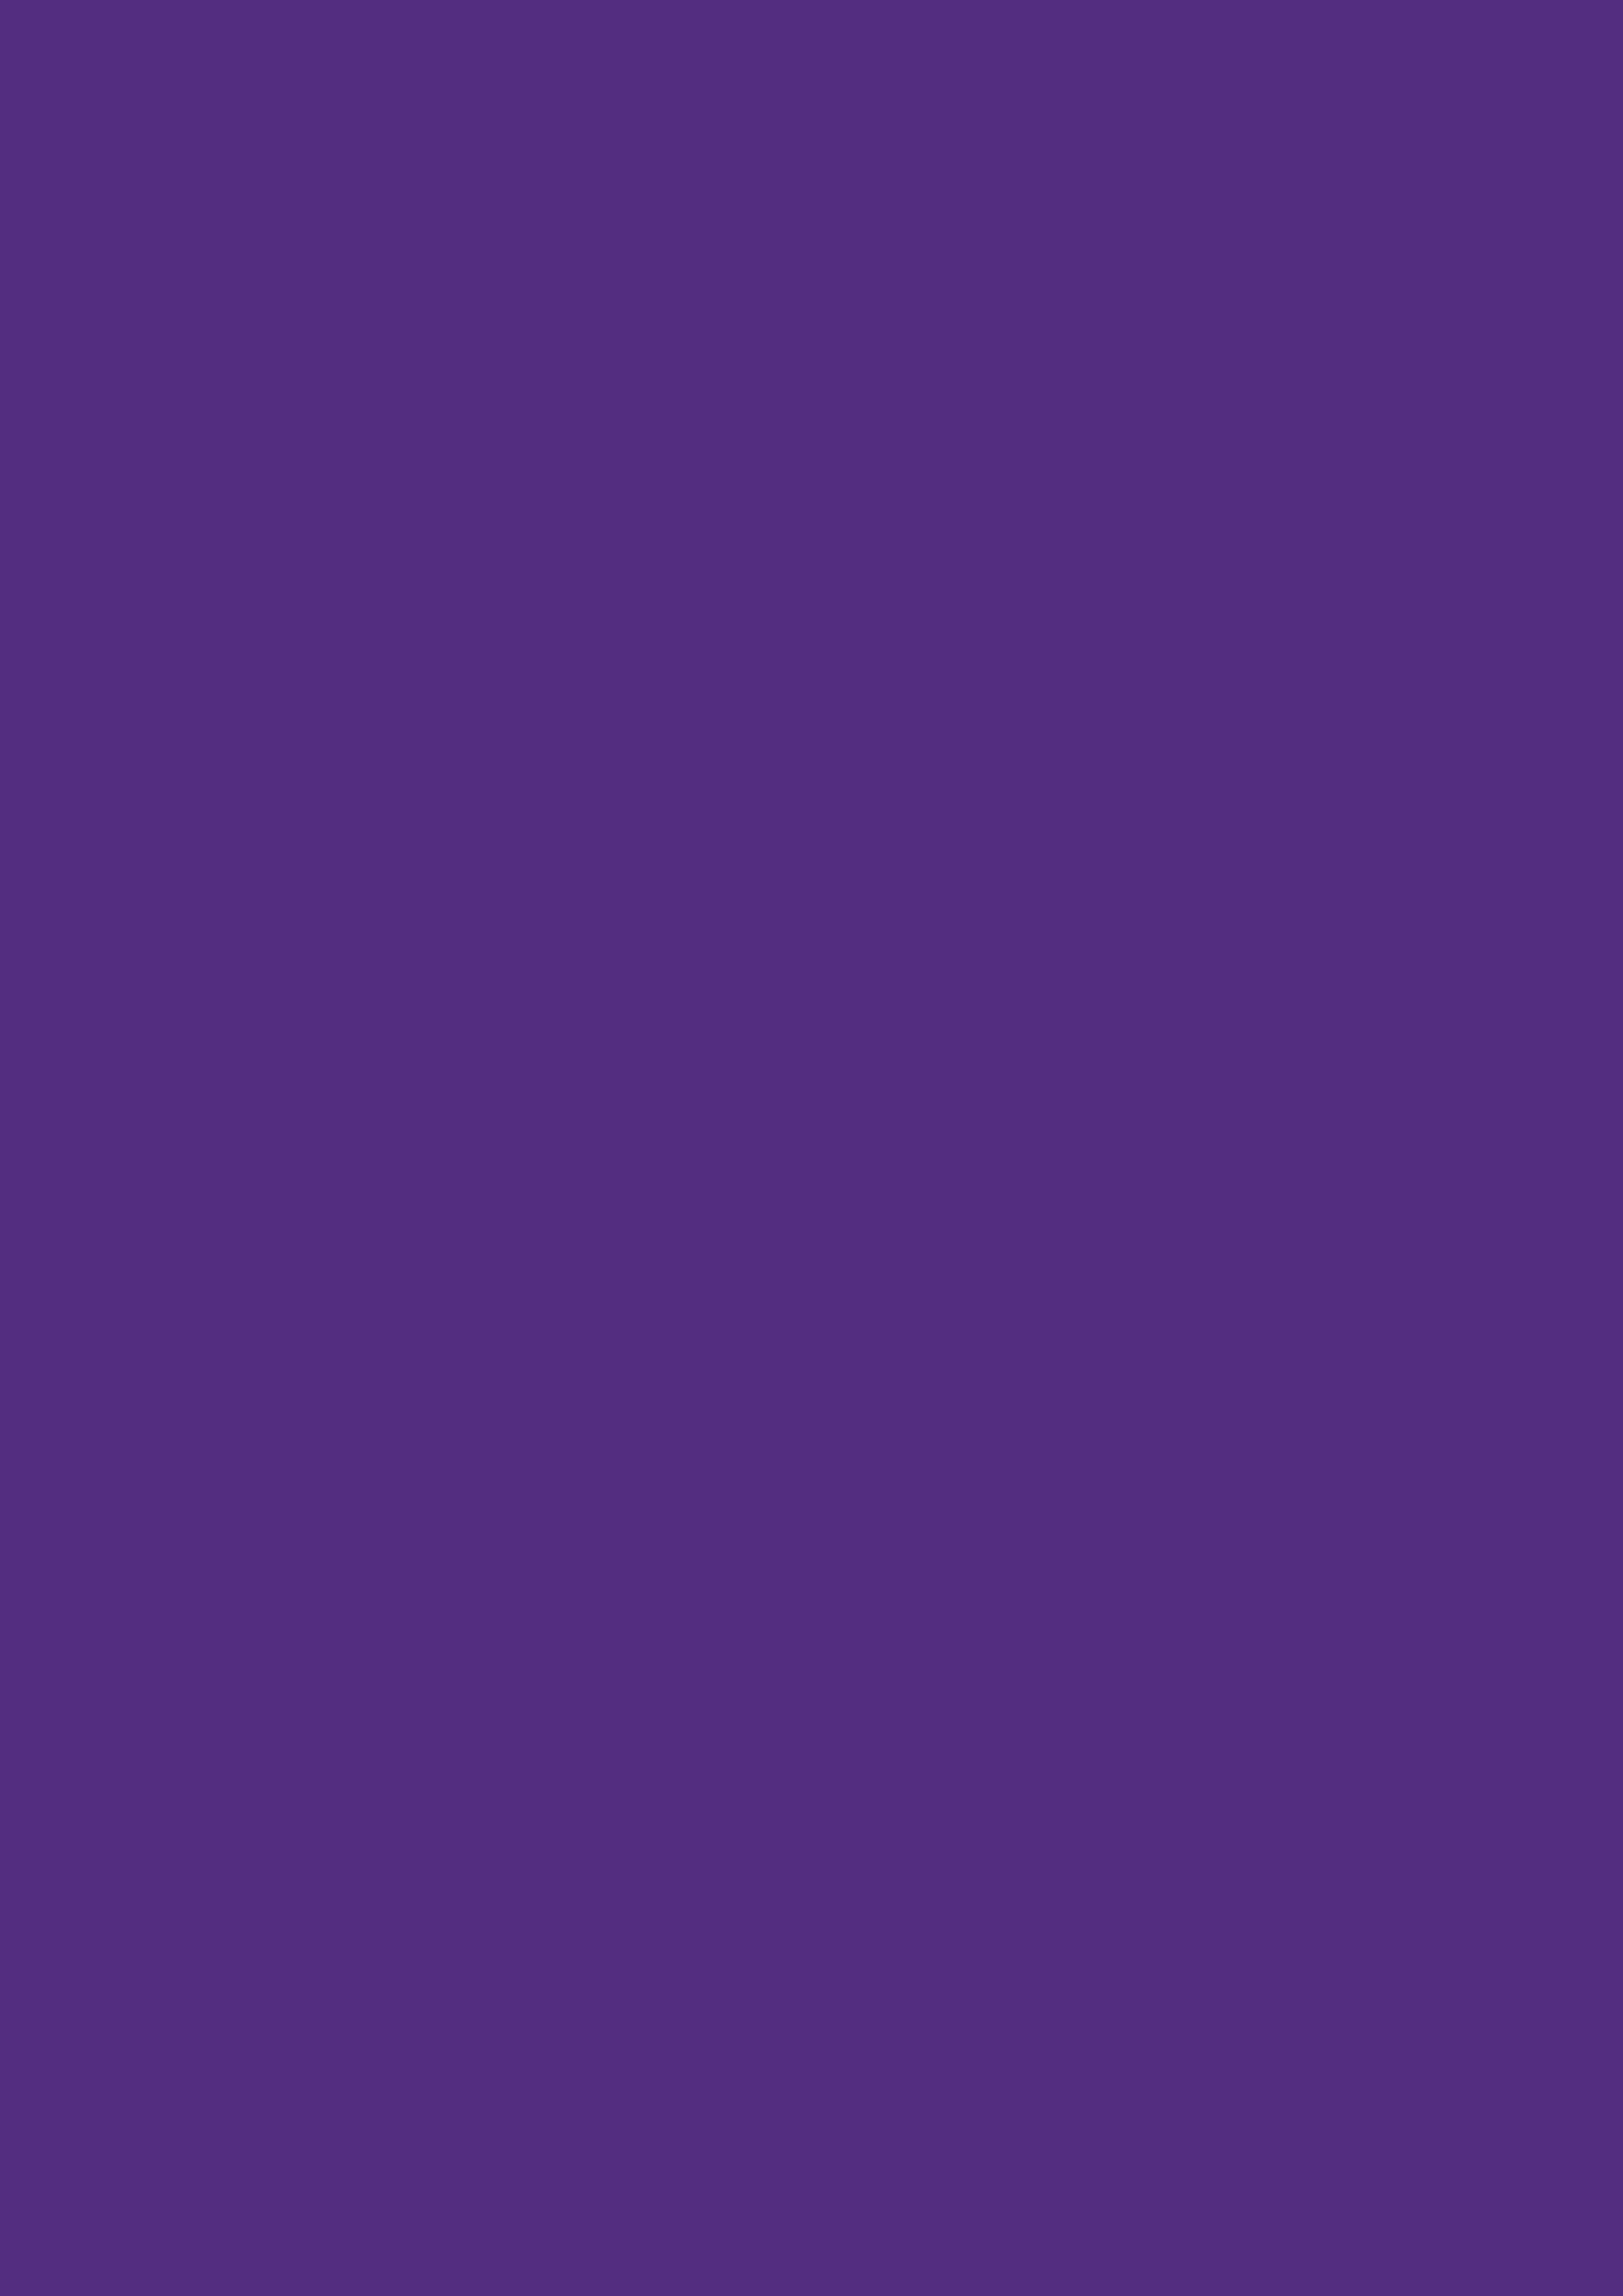 2480x3508 Regalia Solid Color Background